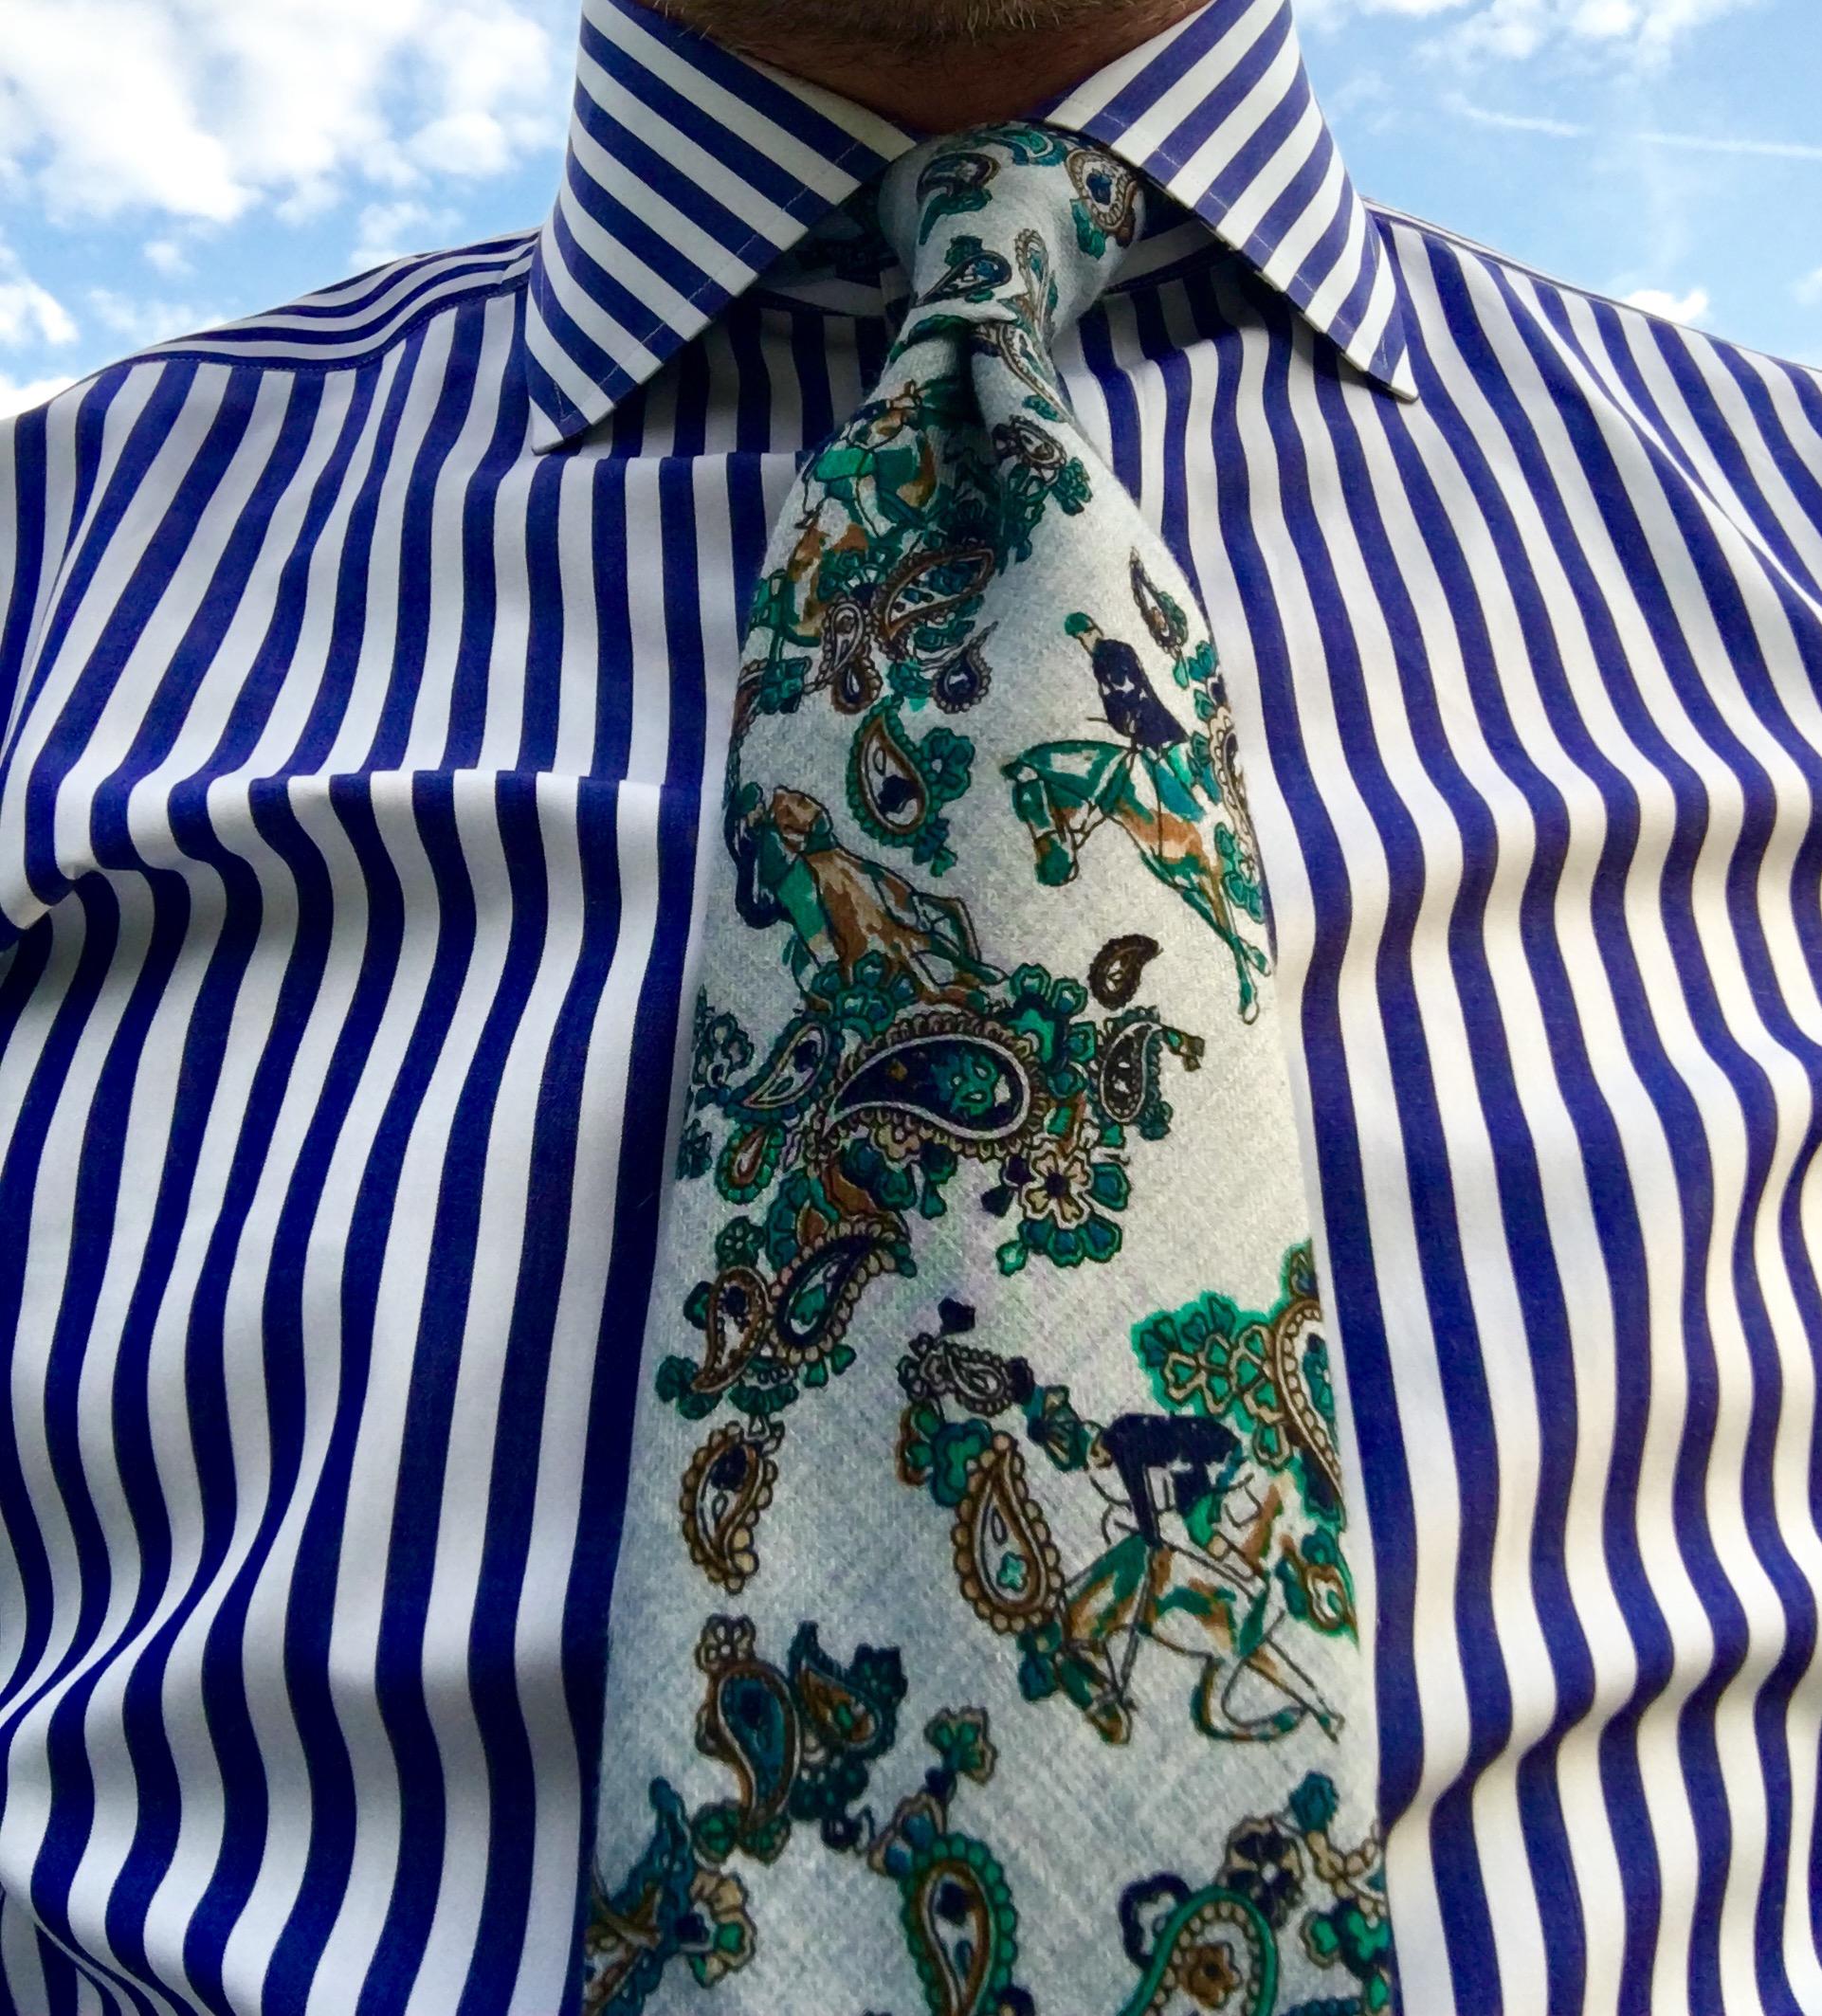 kali77's photos in Yellow Hook Necktie Appreciation Thread